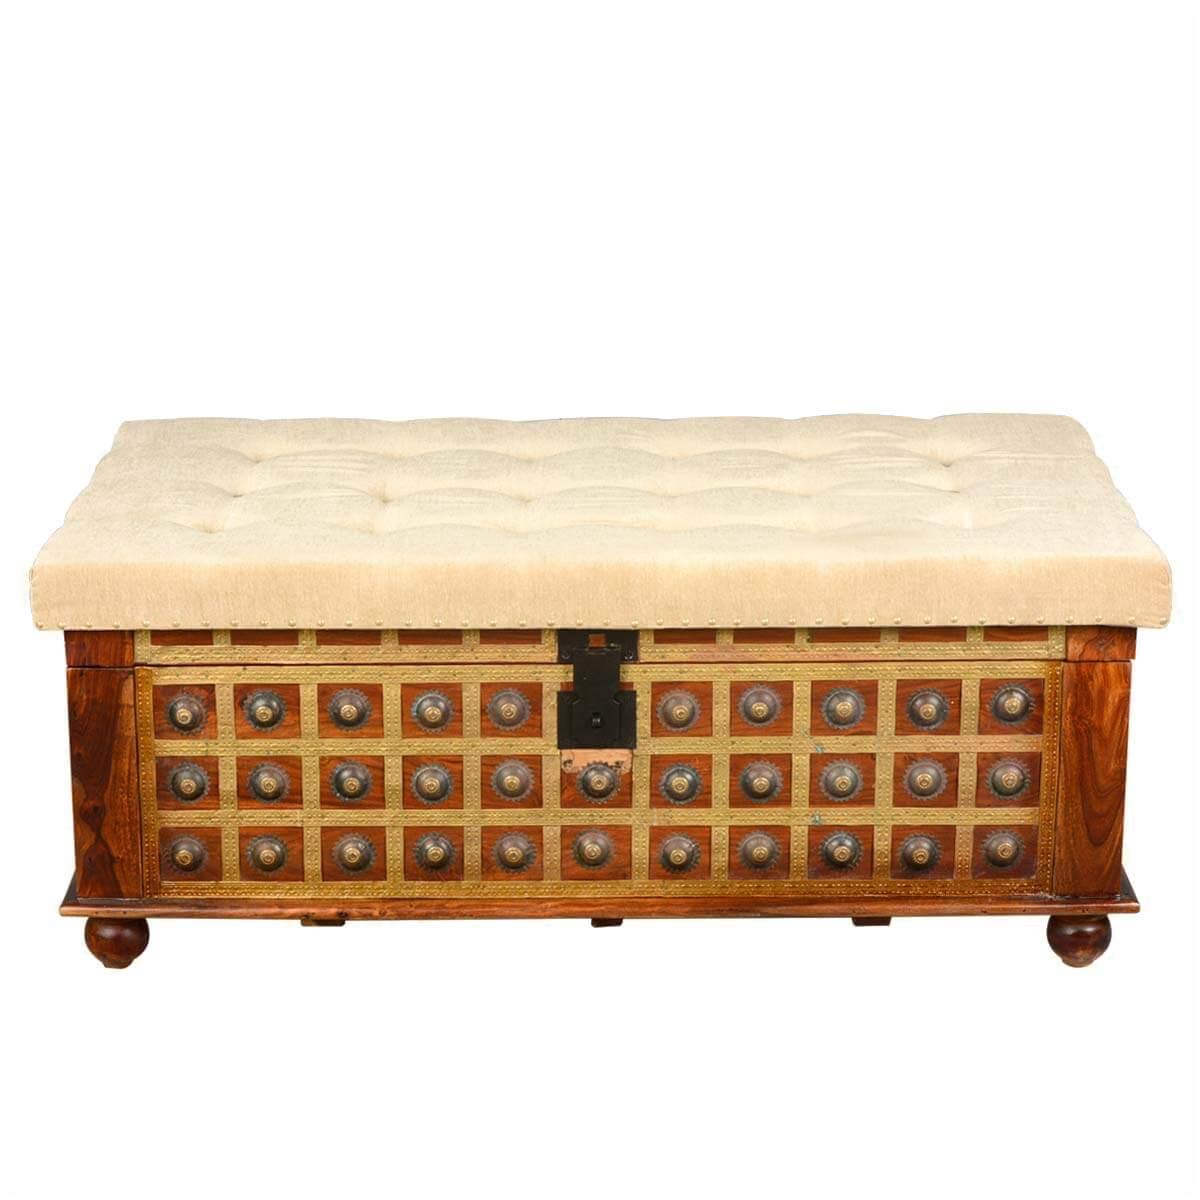 Wood & Brass Everett Upholstered Bedroom Storage Trunk